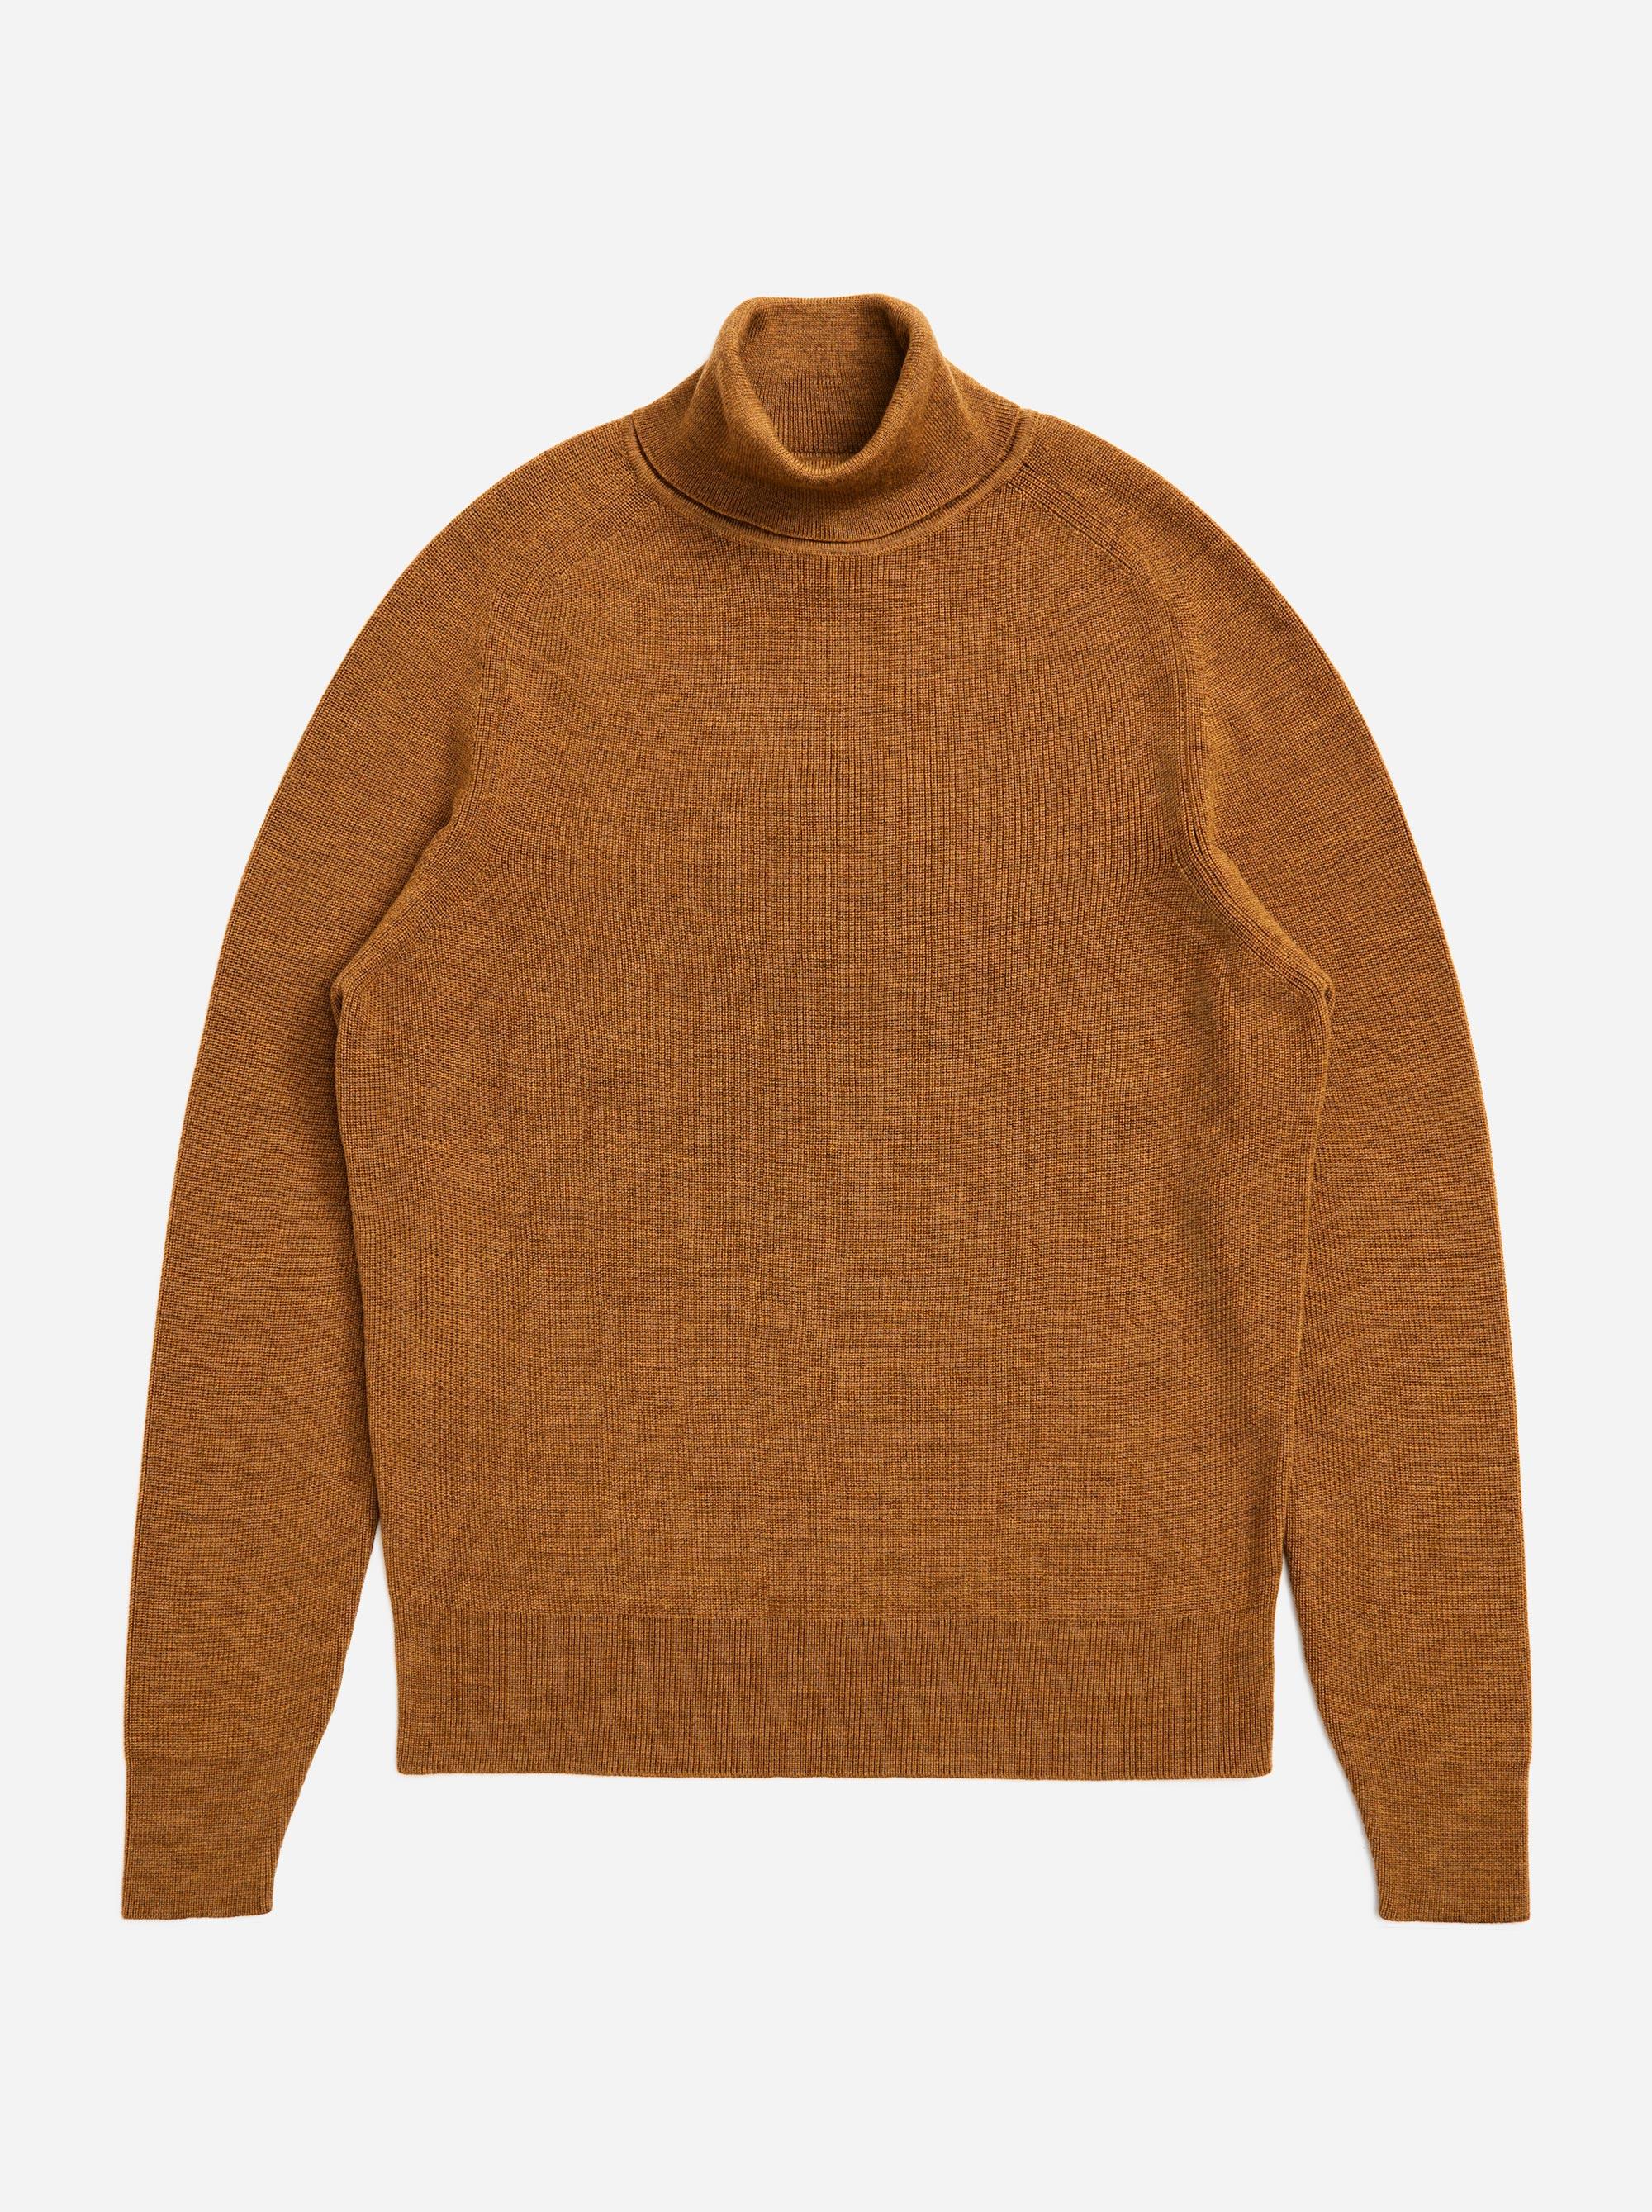 Teym - Turtleneck - The Merino Sweater - Women - Camel - 4